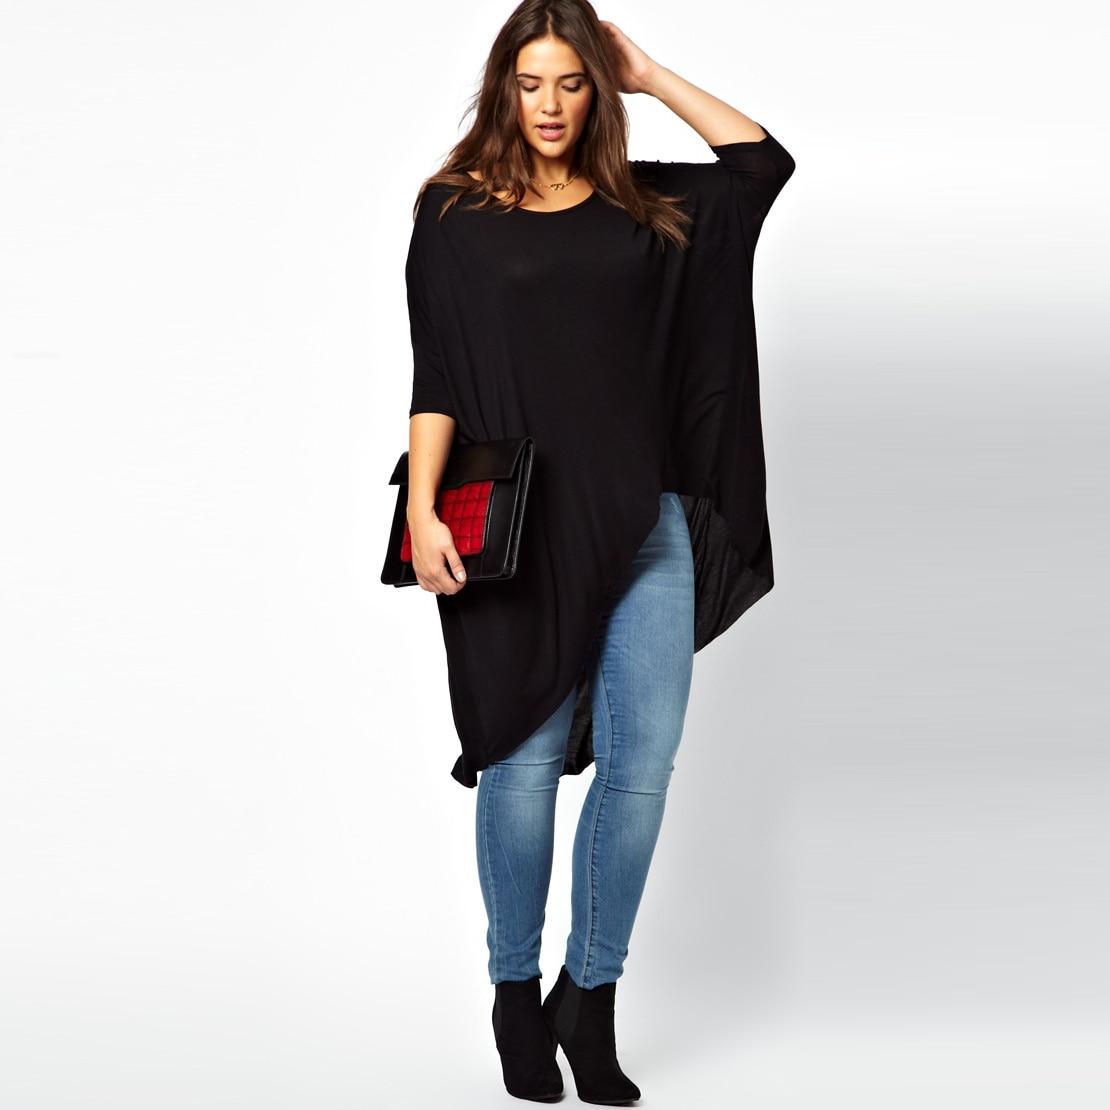 Hot fashion clothes women 76